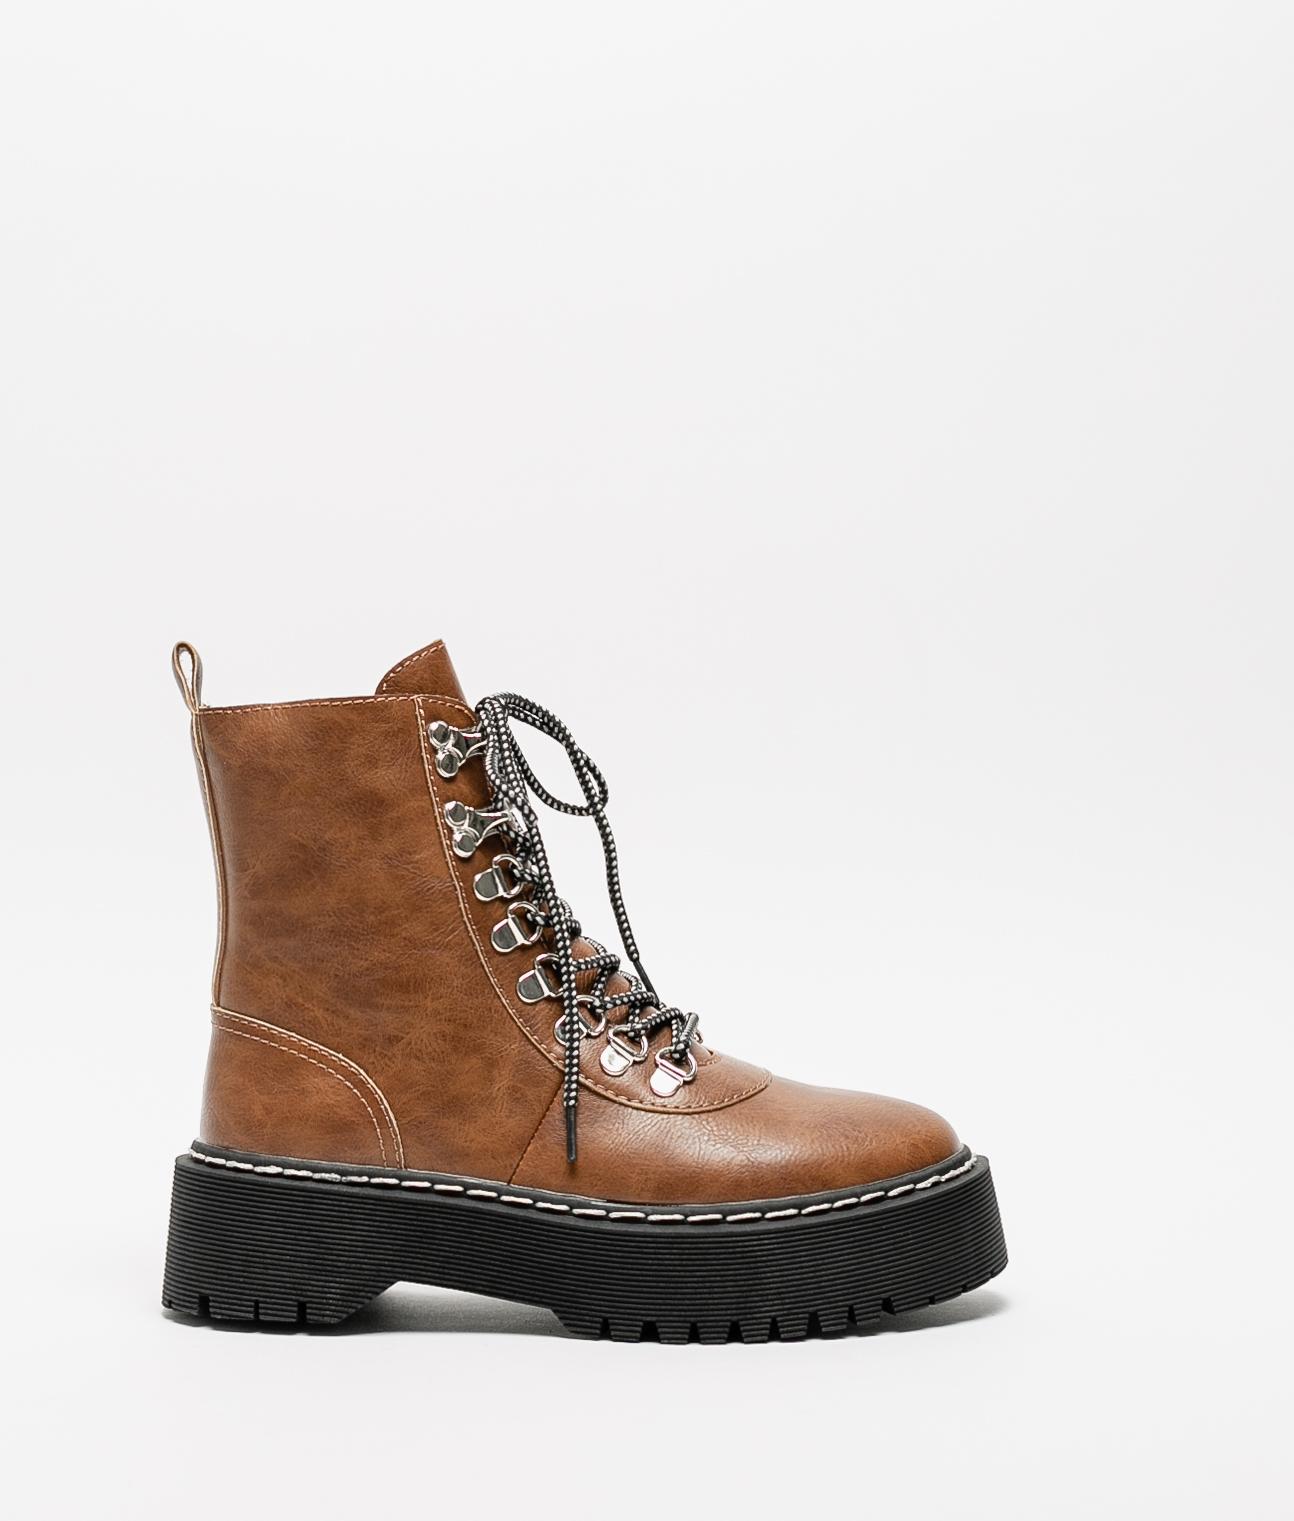 Boot Petite Cedela - Chameau